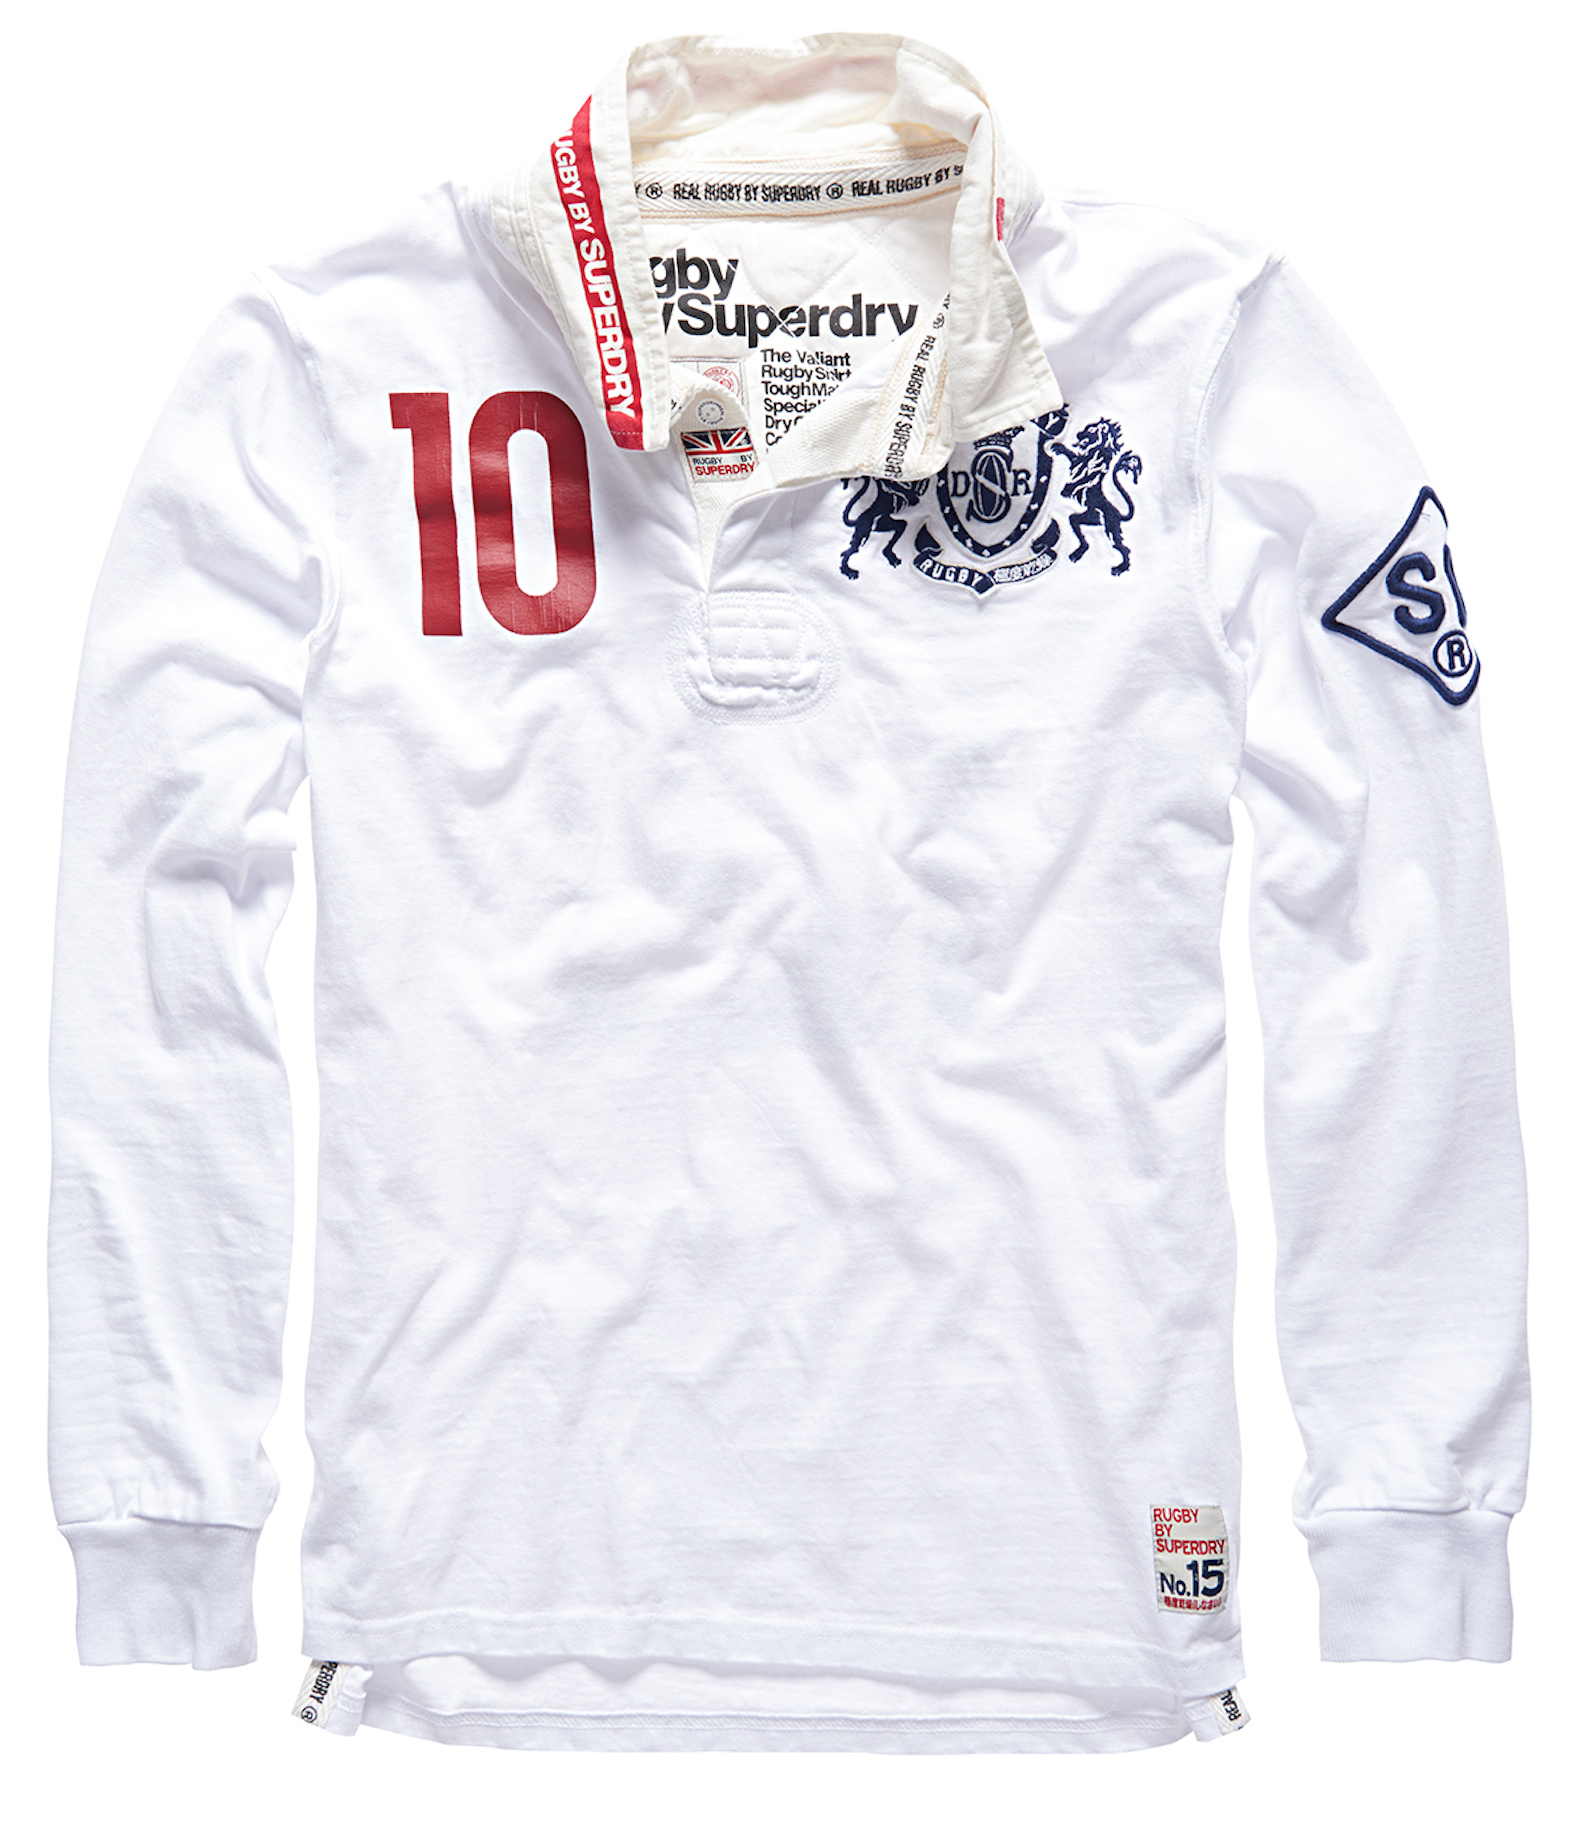 c1d9bd55de3 Stash 'N' Grab: Superdry World Legends Rugby Shirts – Rugby Shirt Watch